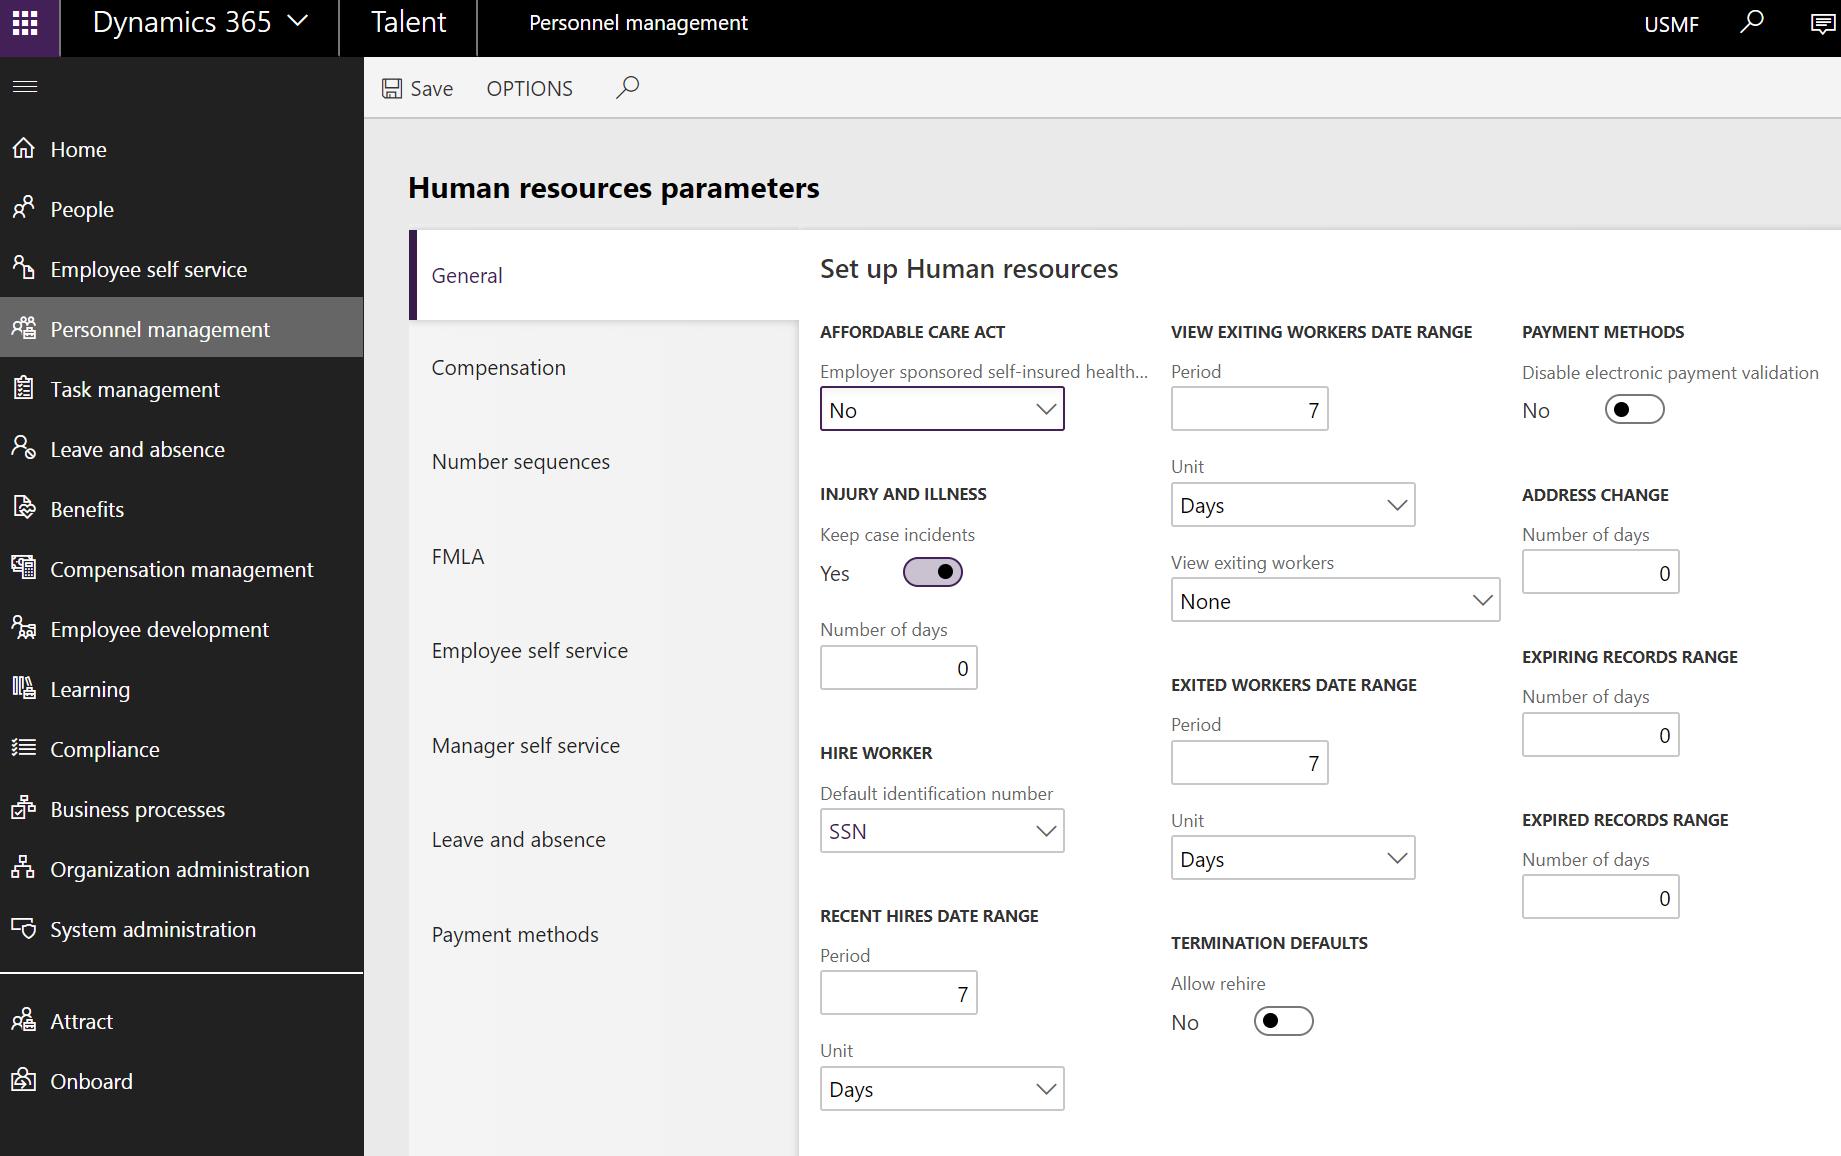 Human resources parameters